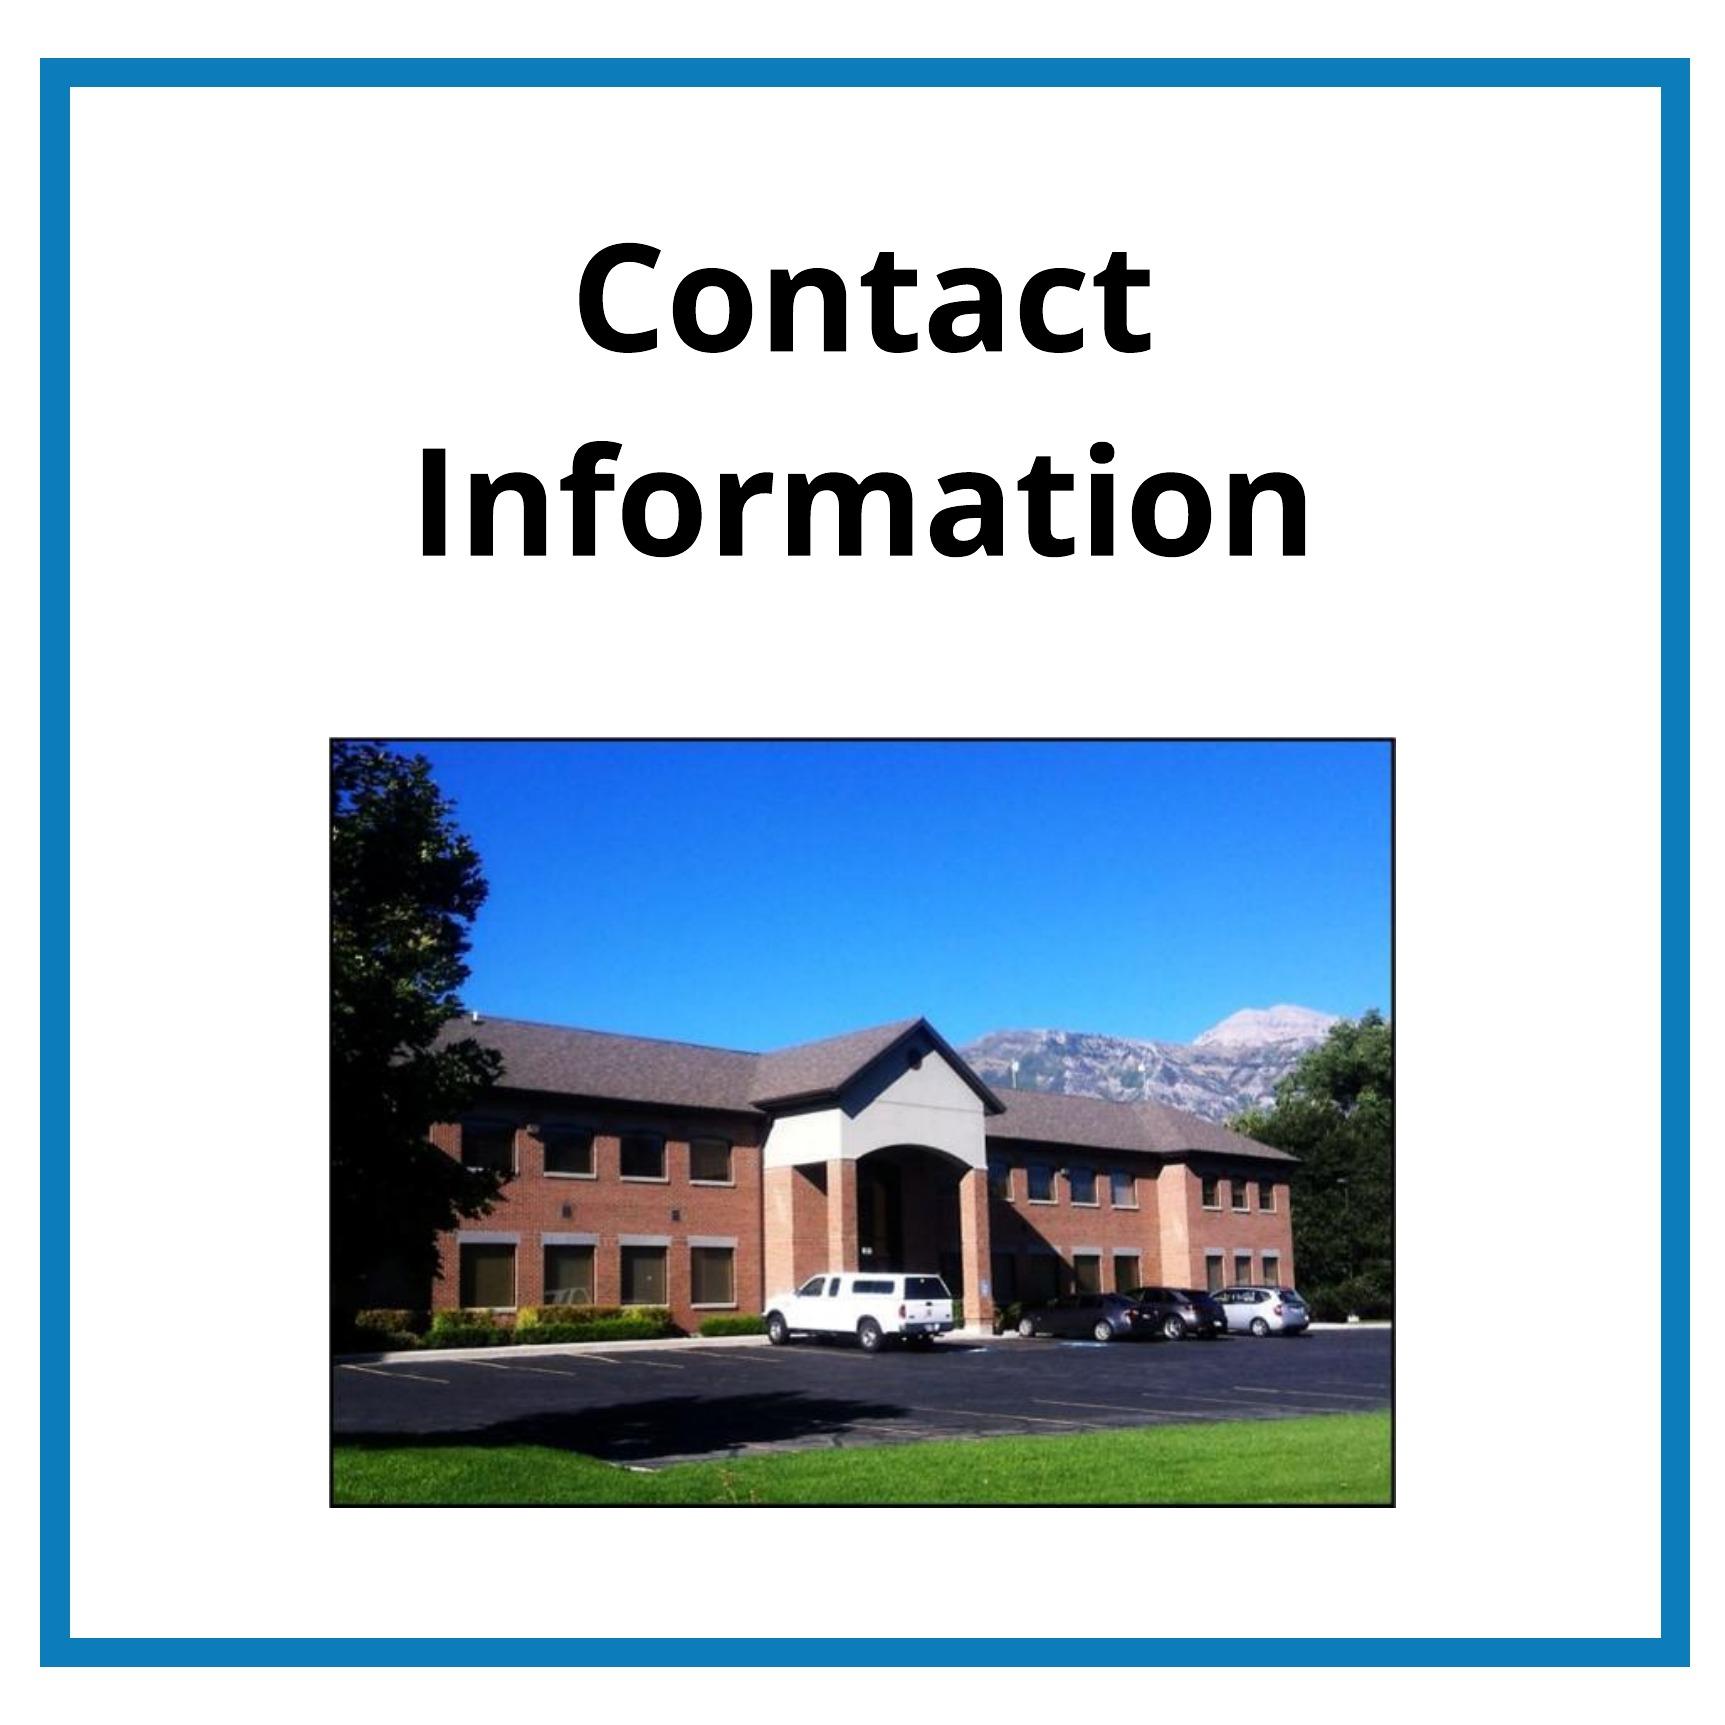 Contact Information (1).jpeg